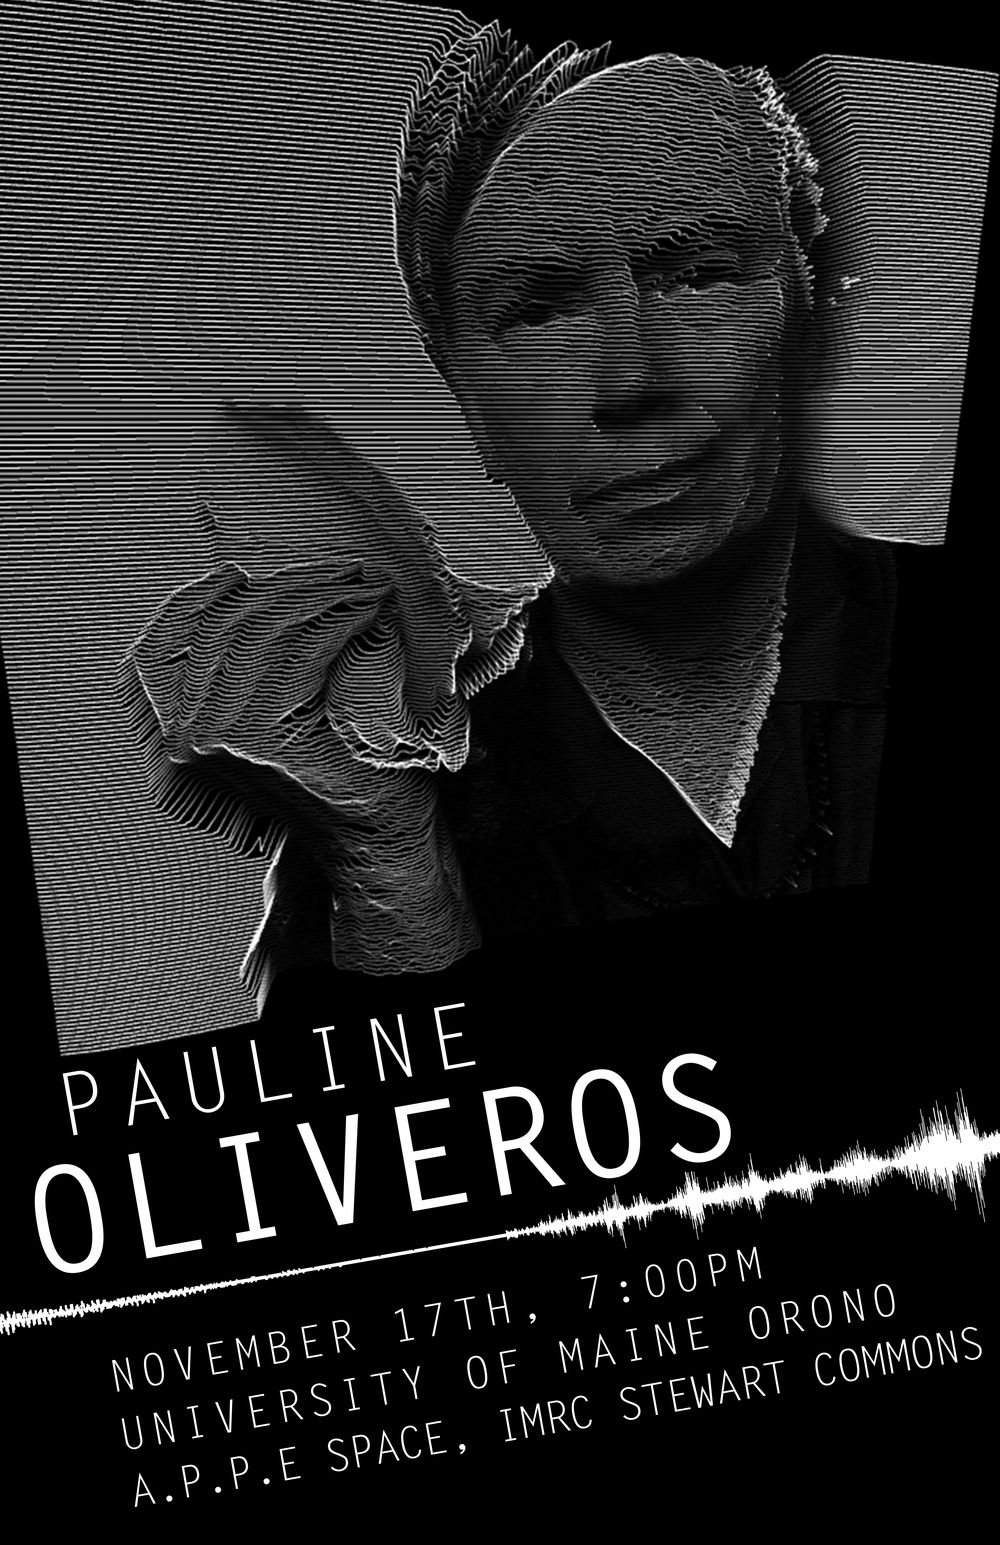 Pauline Oliveros Talk Publicity